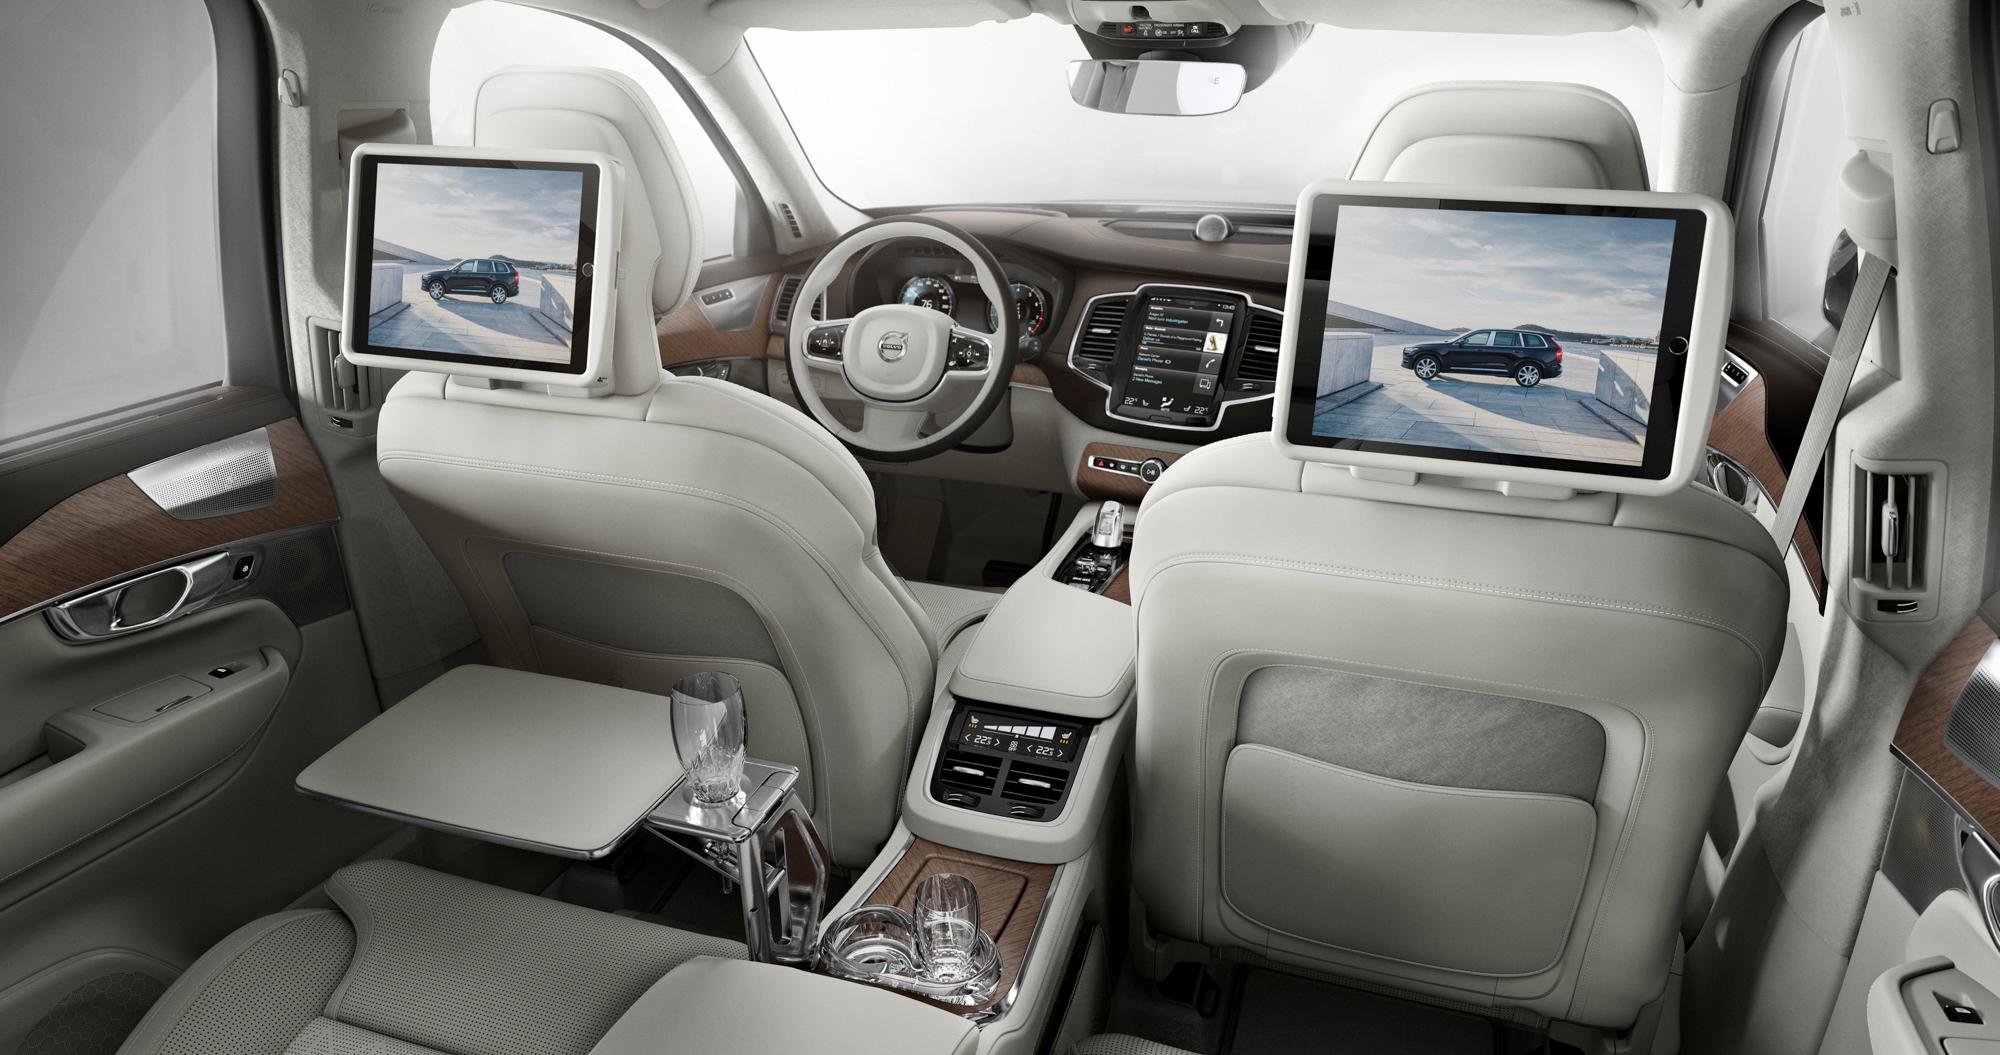 Volvo_XC90_Ex_Int_002.JPG